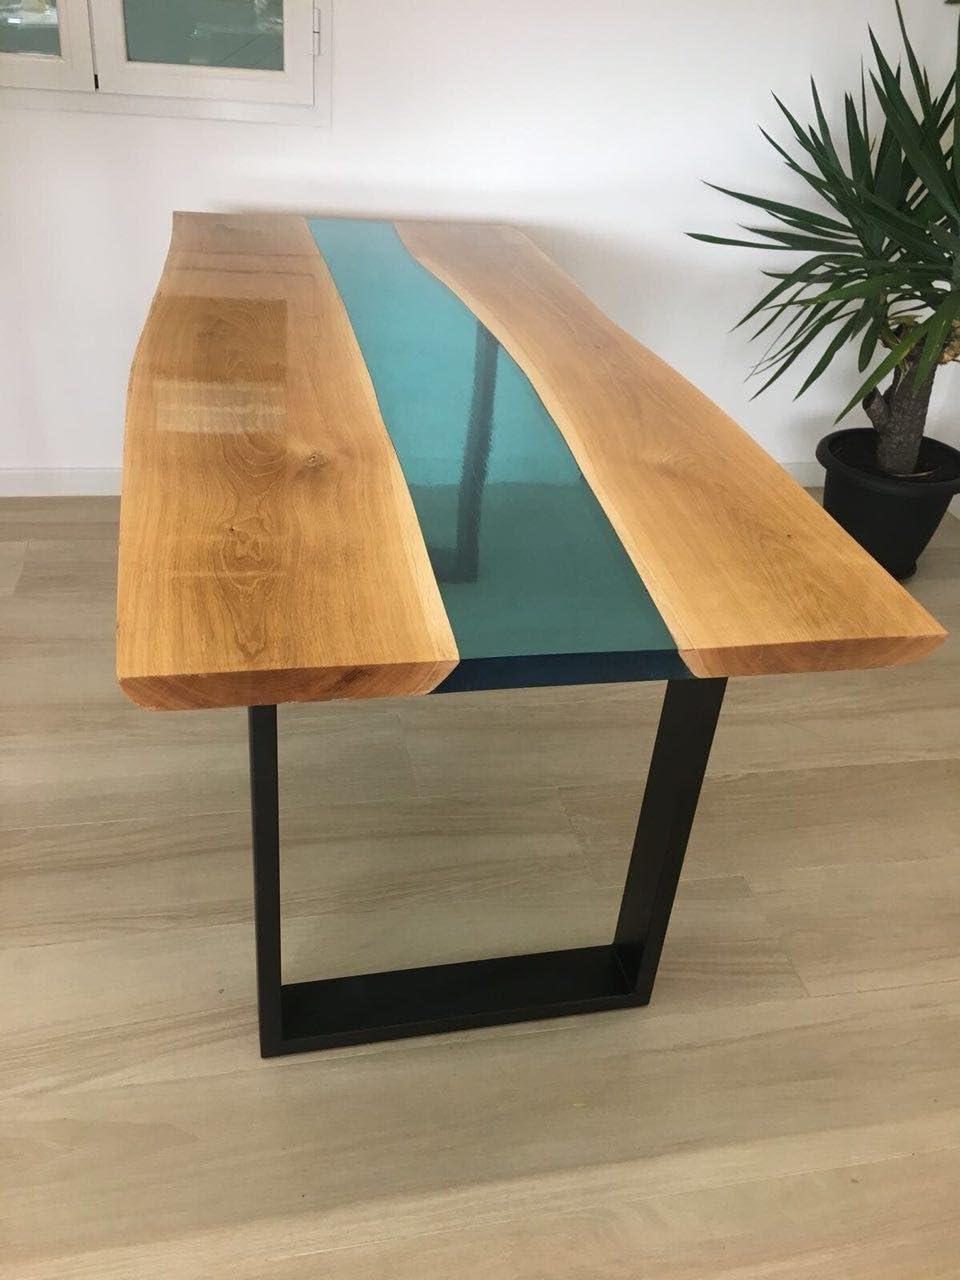 Table Bois Resine Epoxy Prix